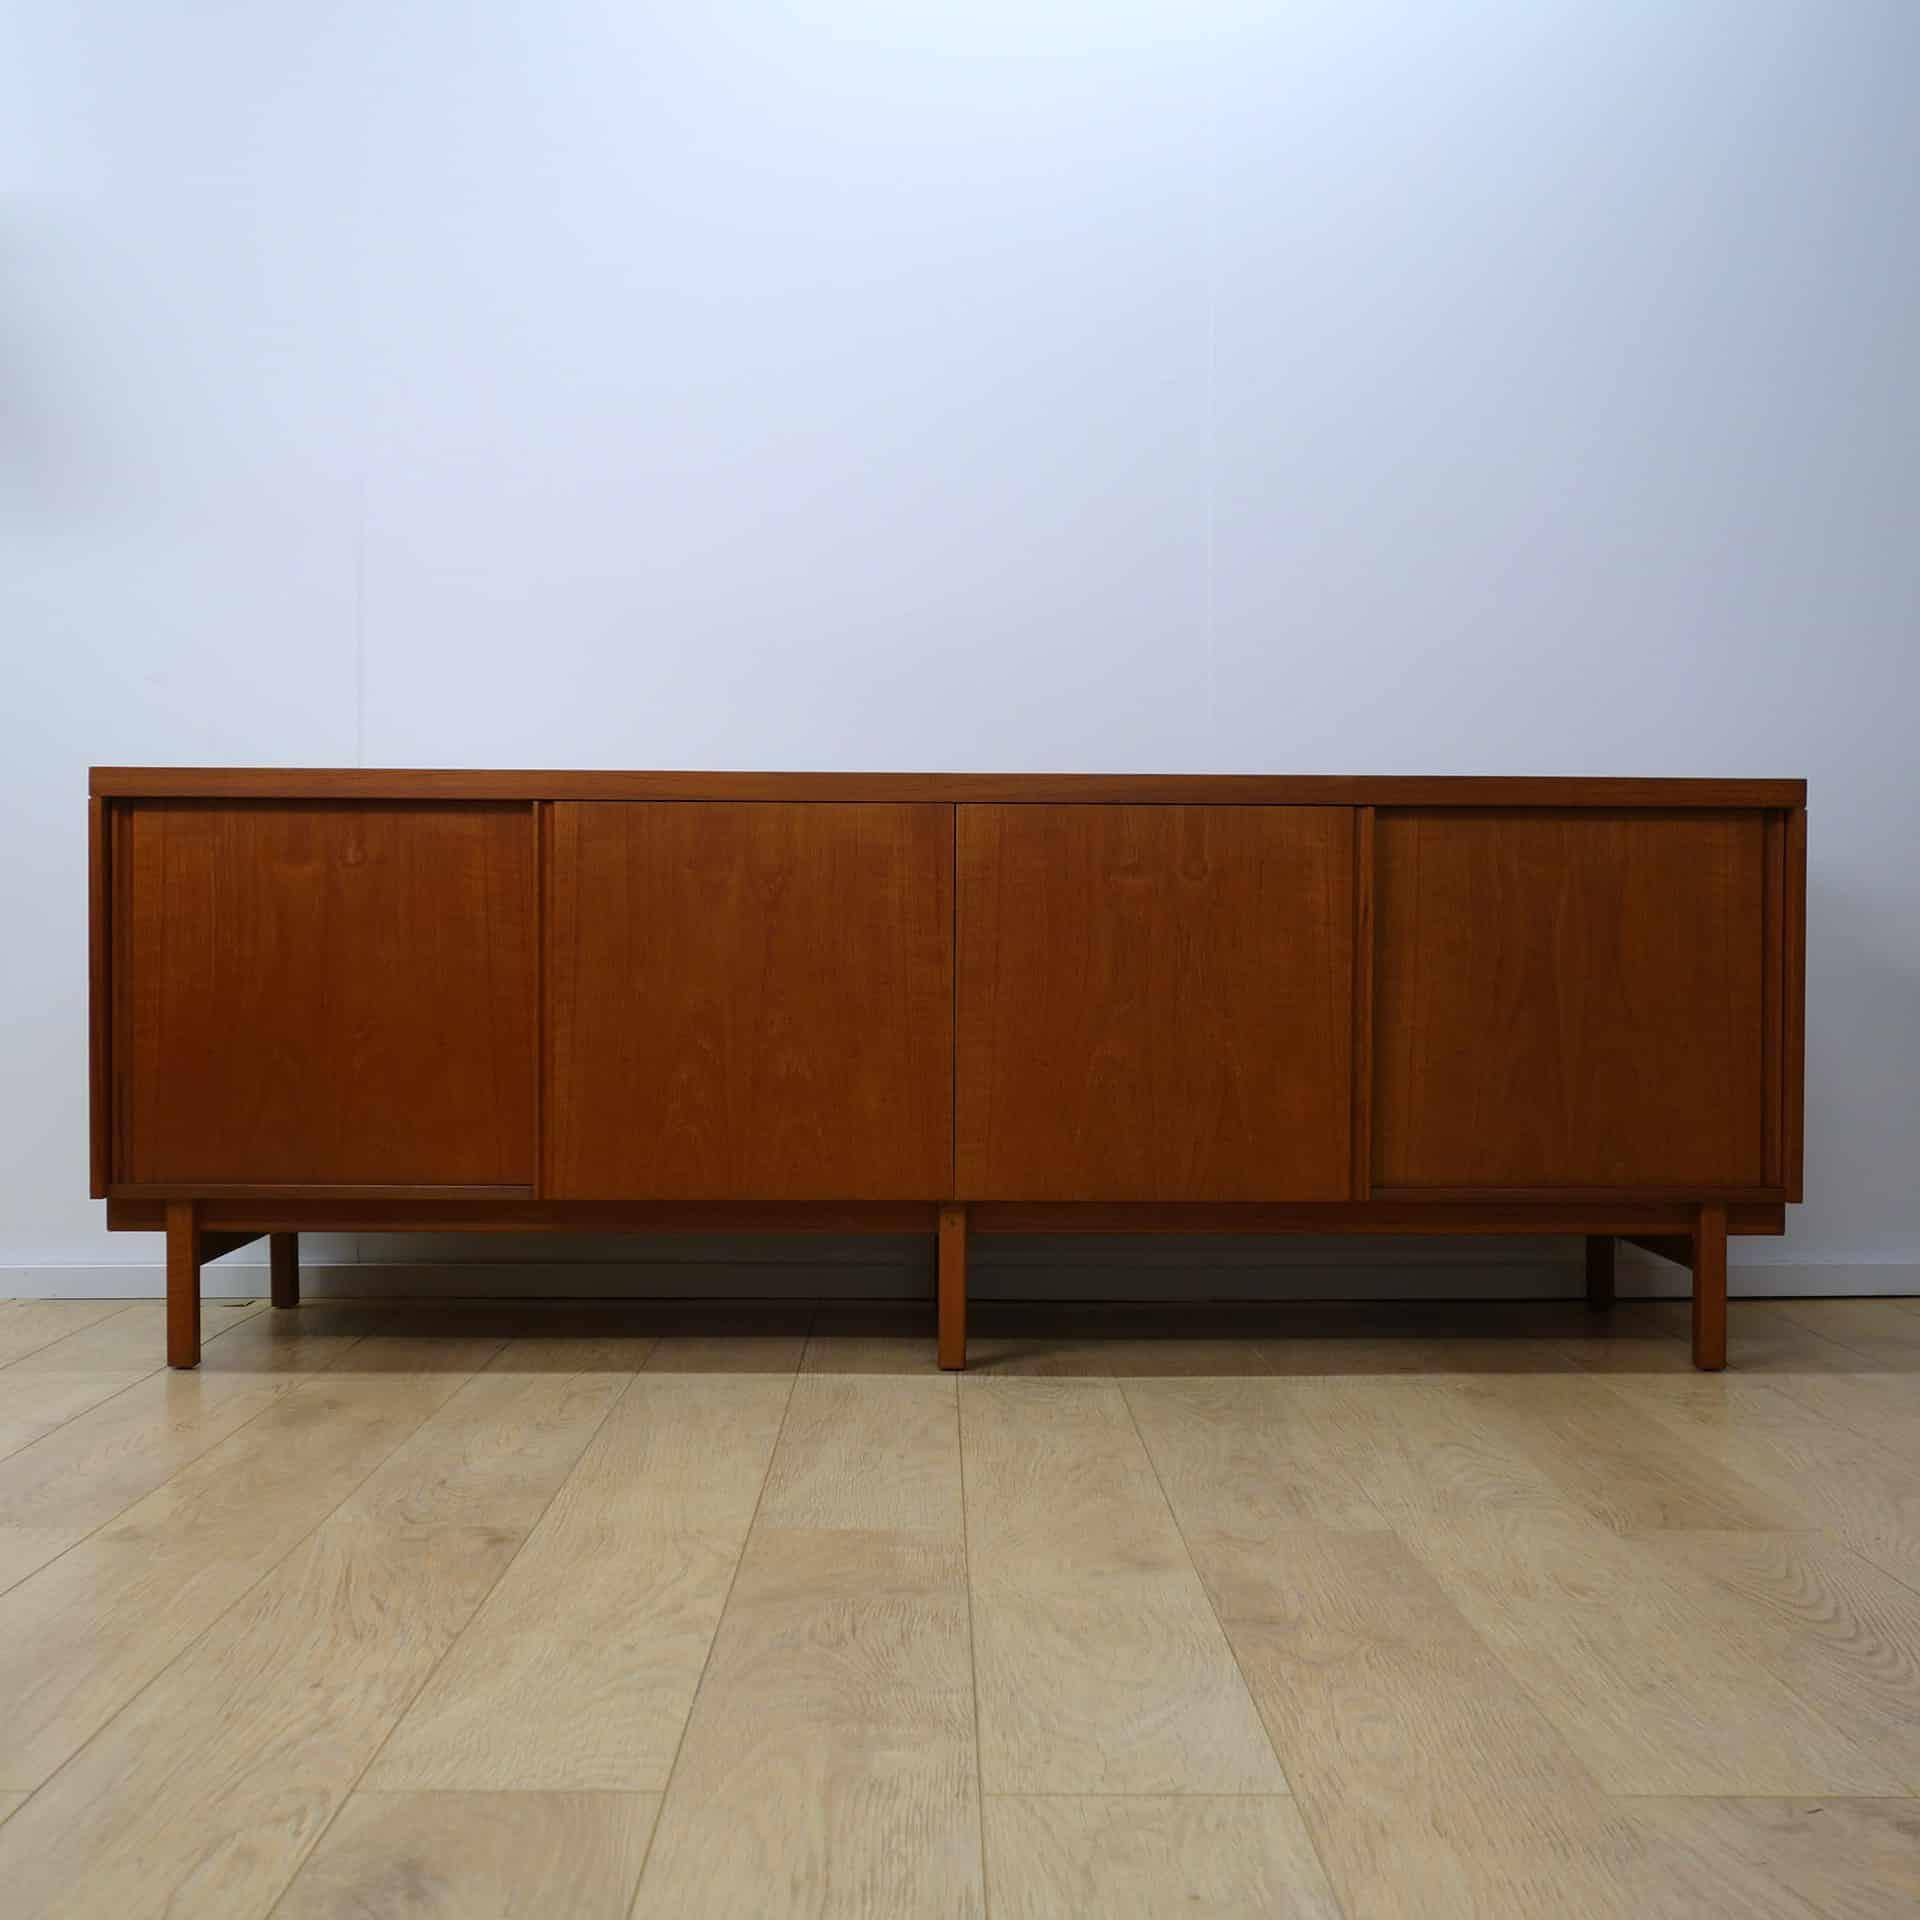 Rare teak sideboard by Richard Hornby